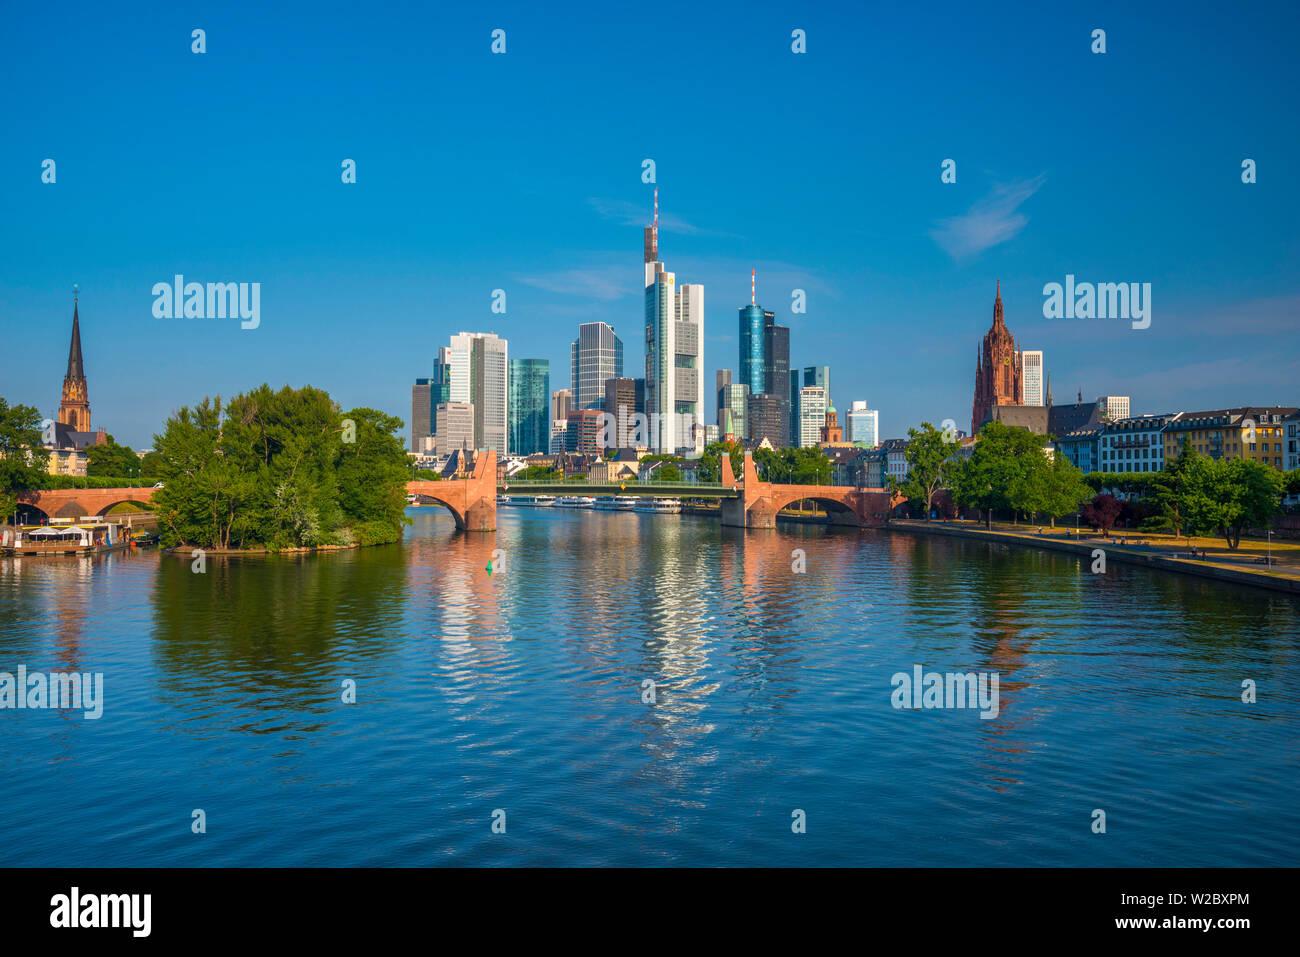 Germany, Hessen, Frankfurt Am Main, City Skyline across River Main Stock Photo